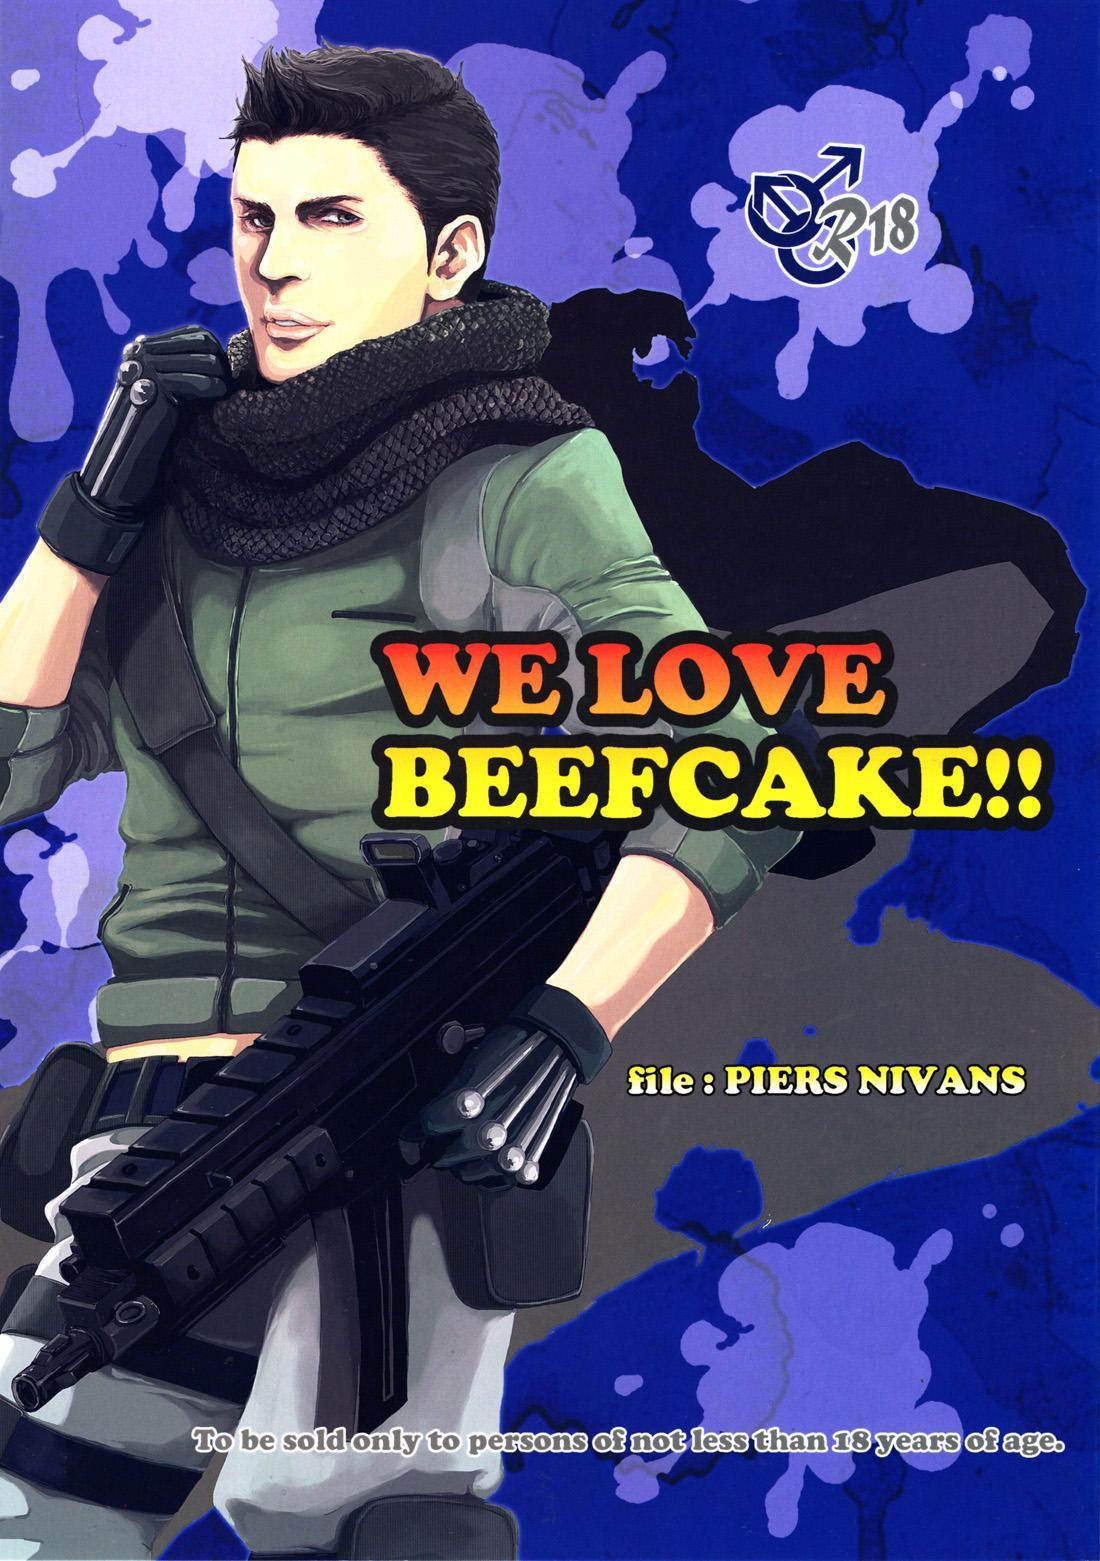 Oinarioimo:We love beefcake 0